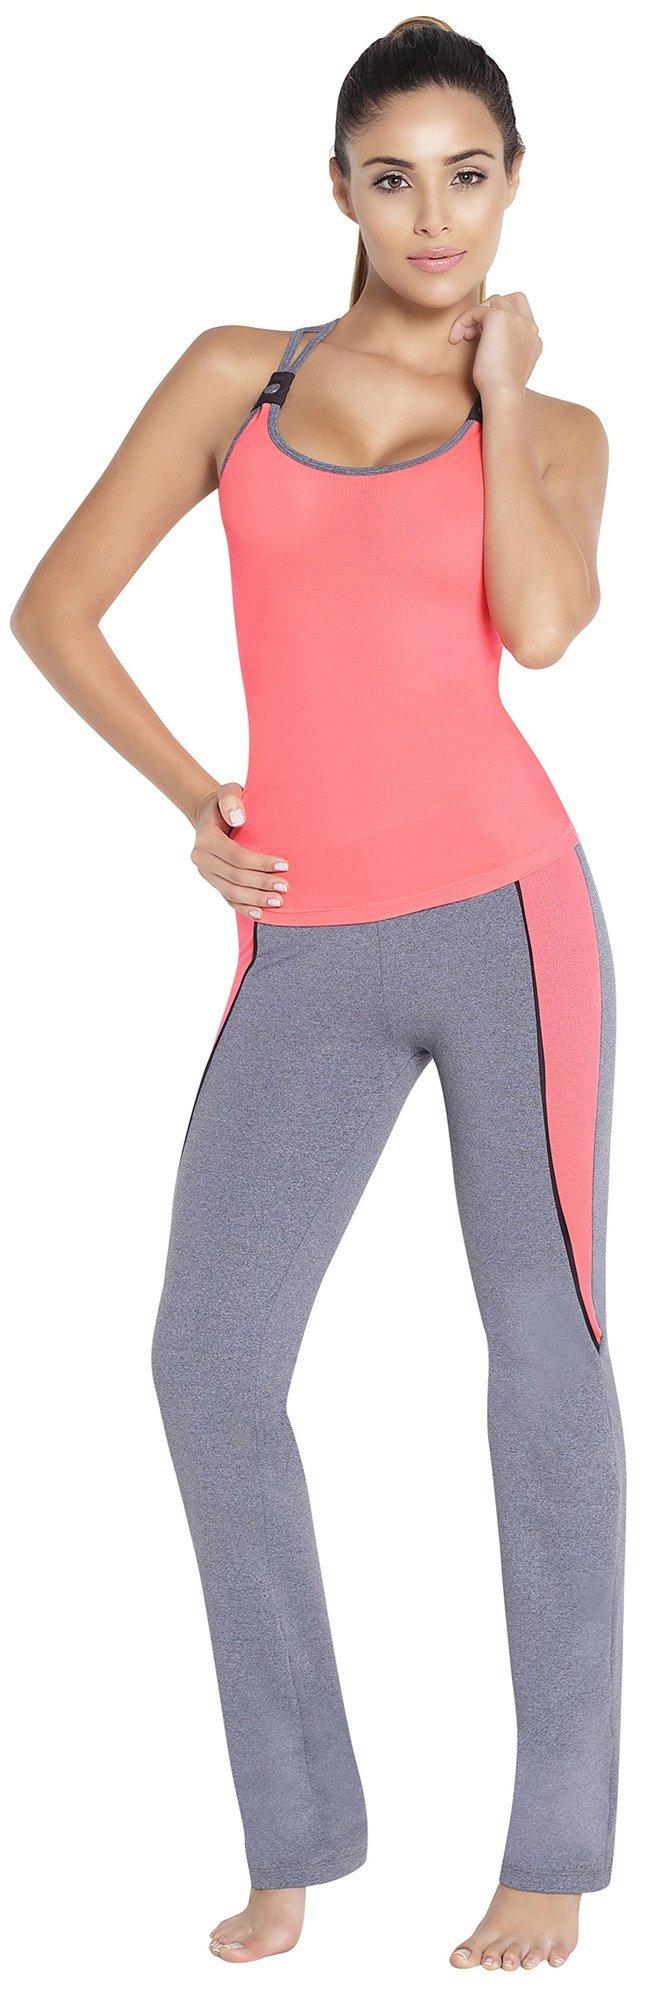 Adriana Arango Women's Gym Outfit Racerback 2 Piece Set Blouse Pants D221 (M) by Adriana Arango